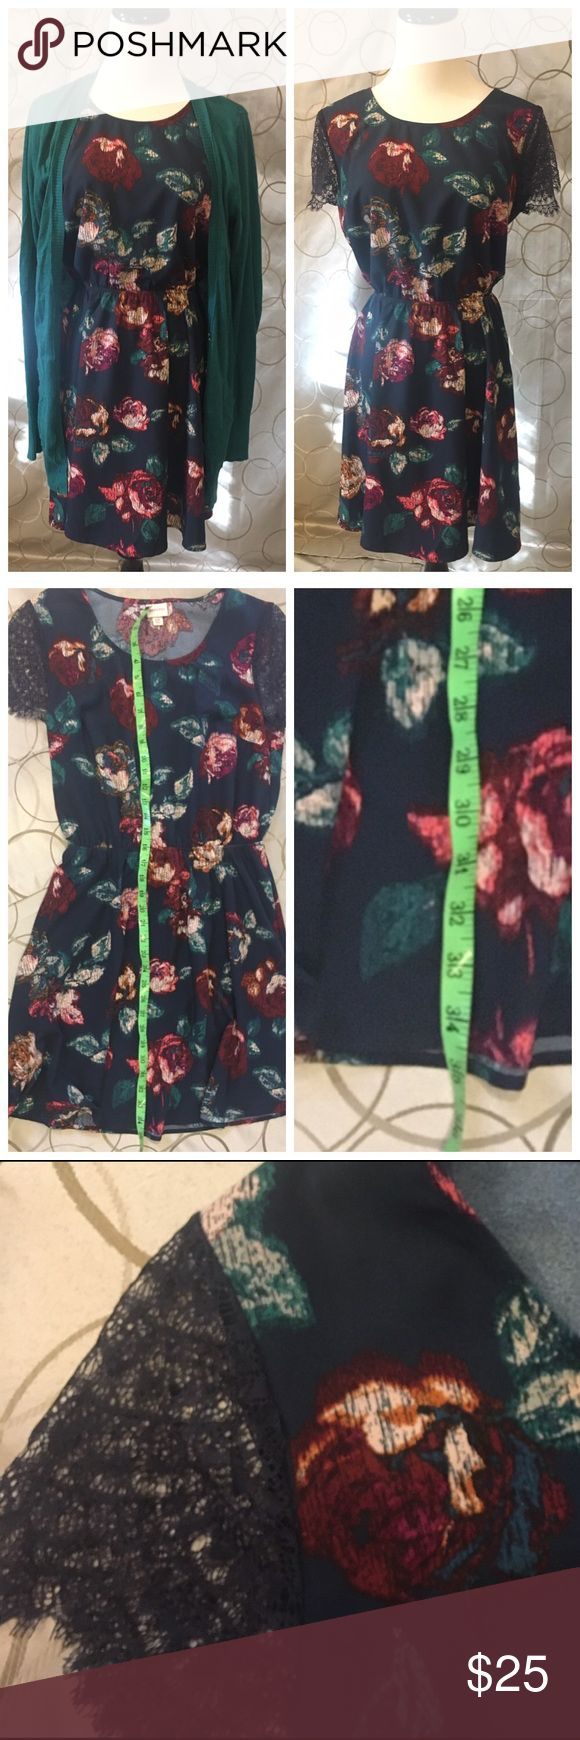 Navy floral dress and matching long green sweater. Navy floral dress and matching long green sweater. By Merona. Merona Dresses Mini